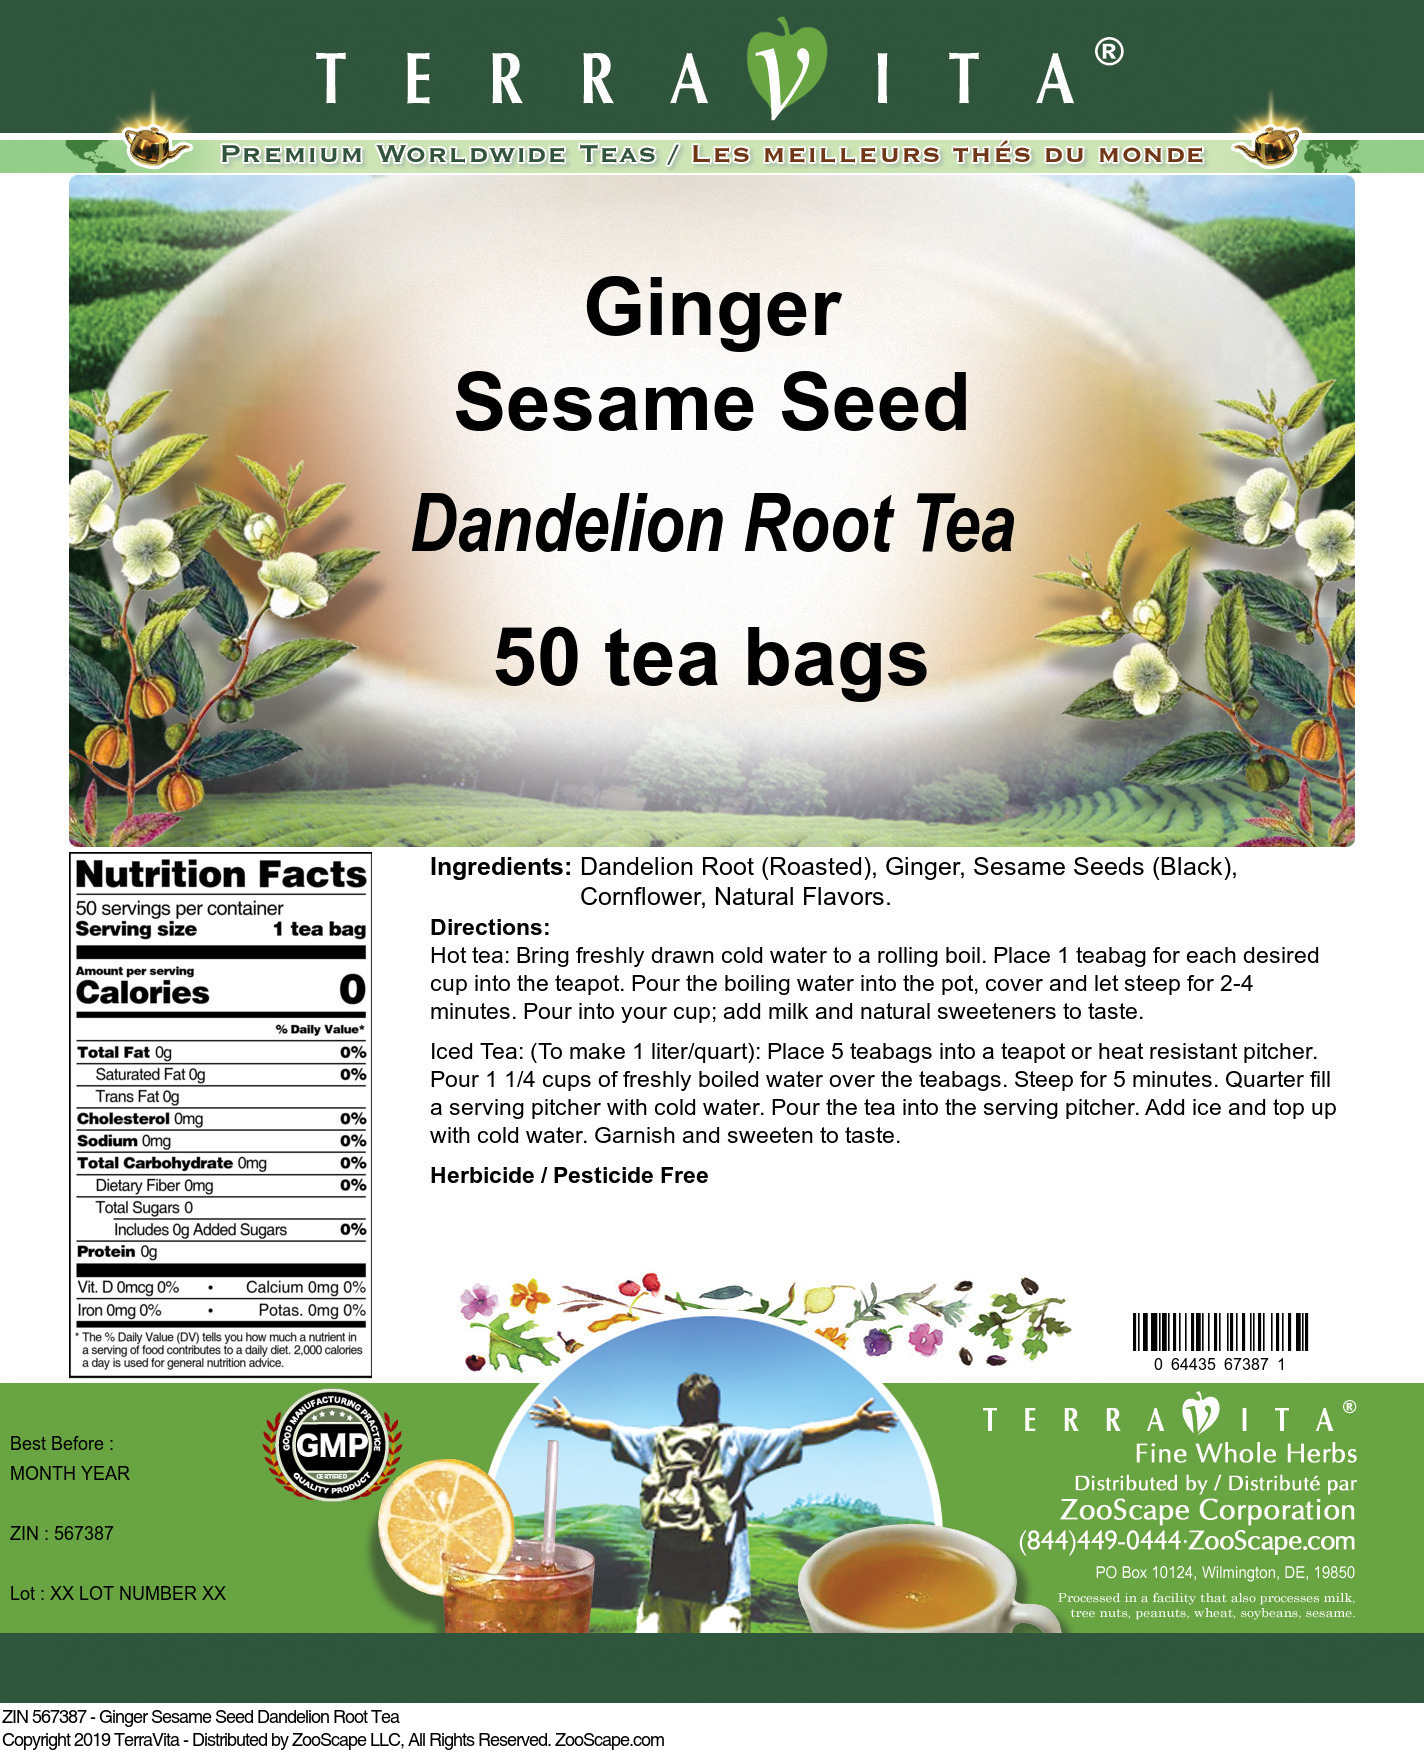 Ginger Sesame Seed Dandelion Root